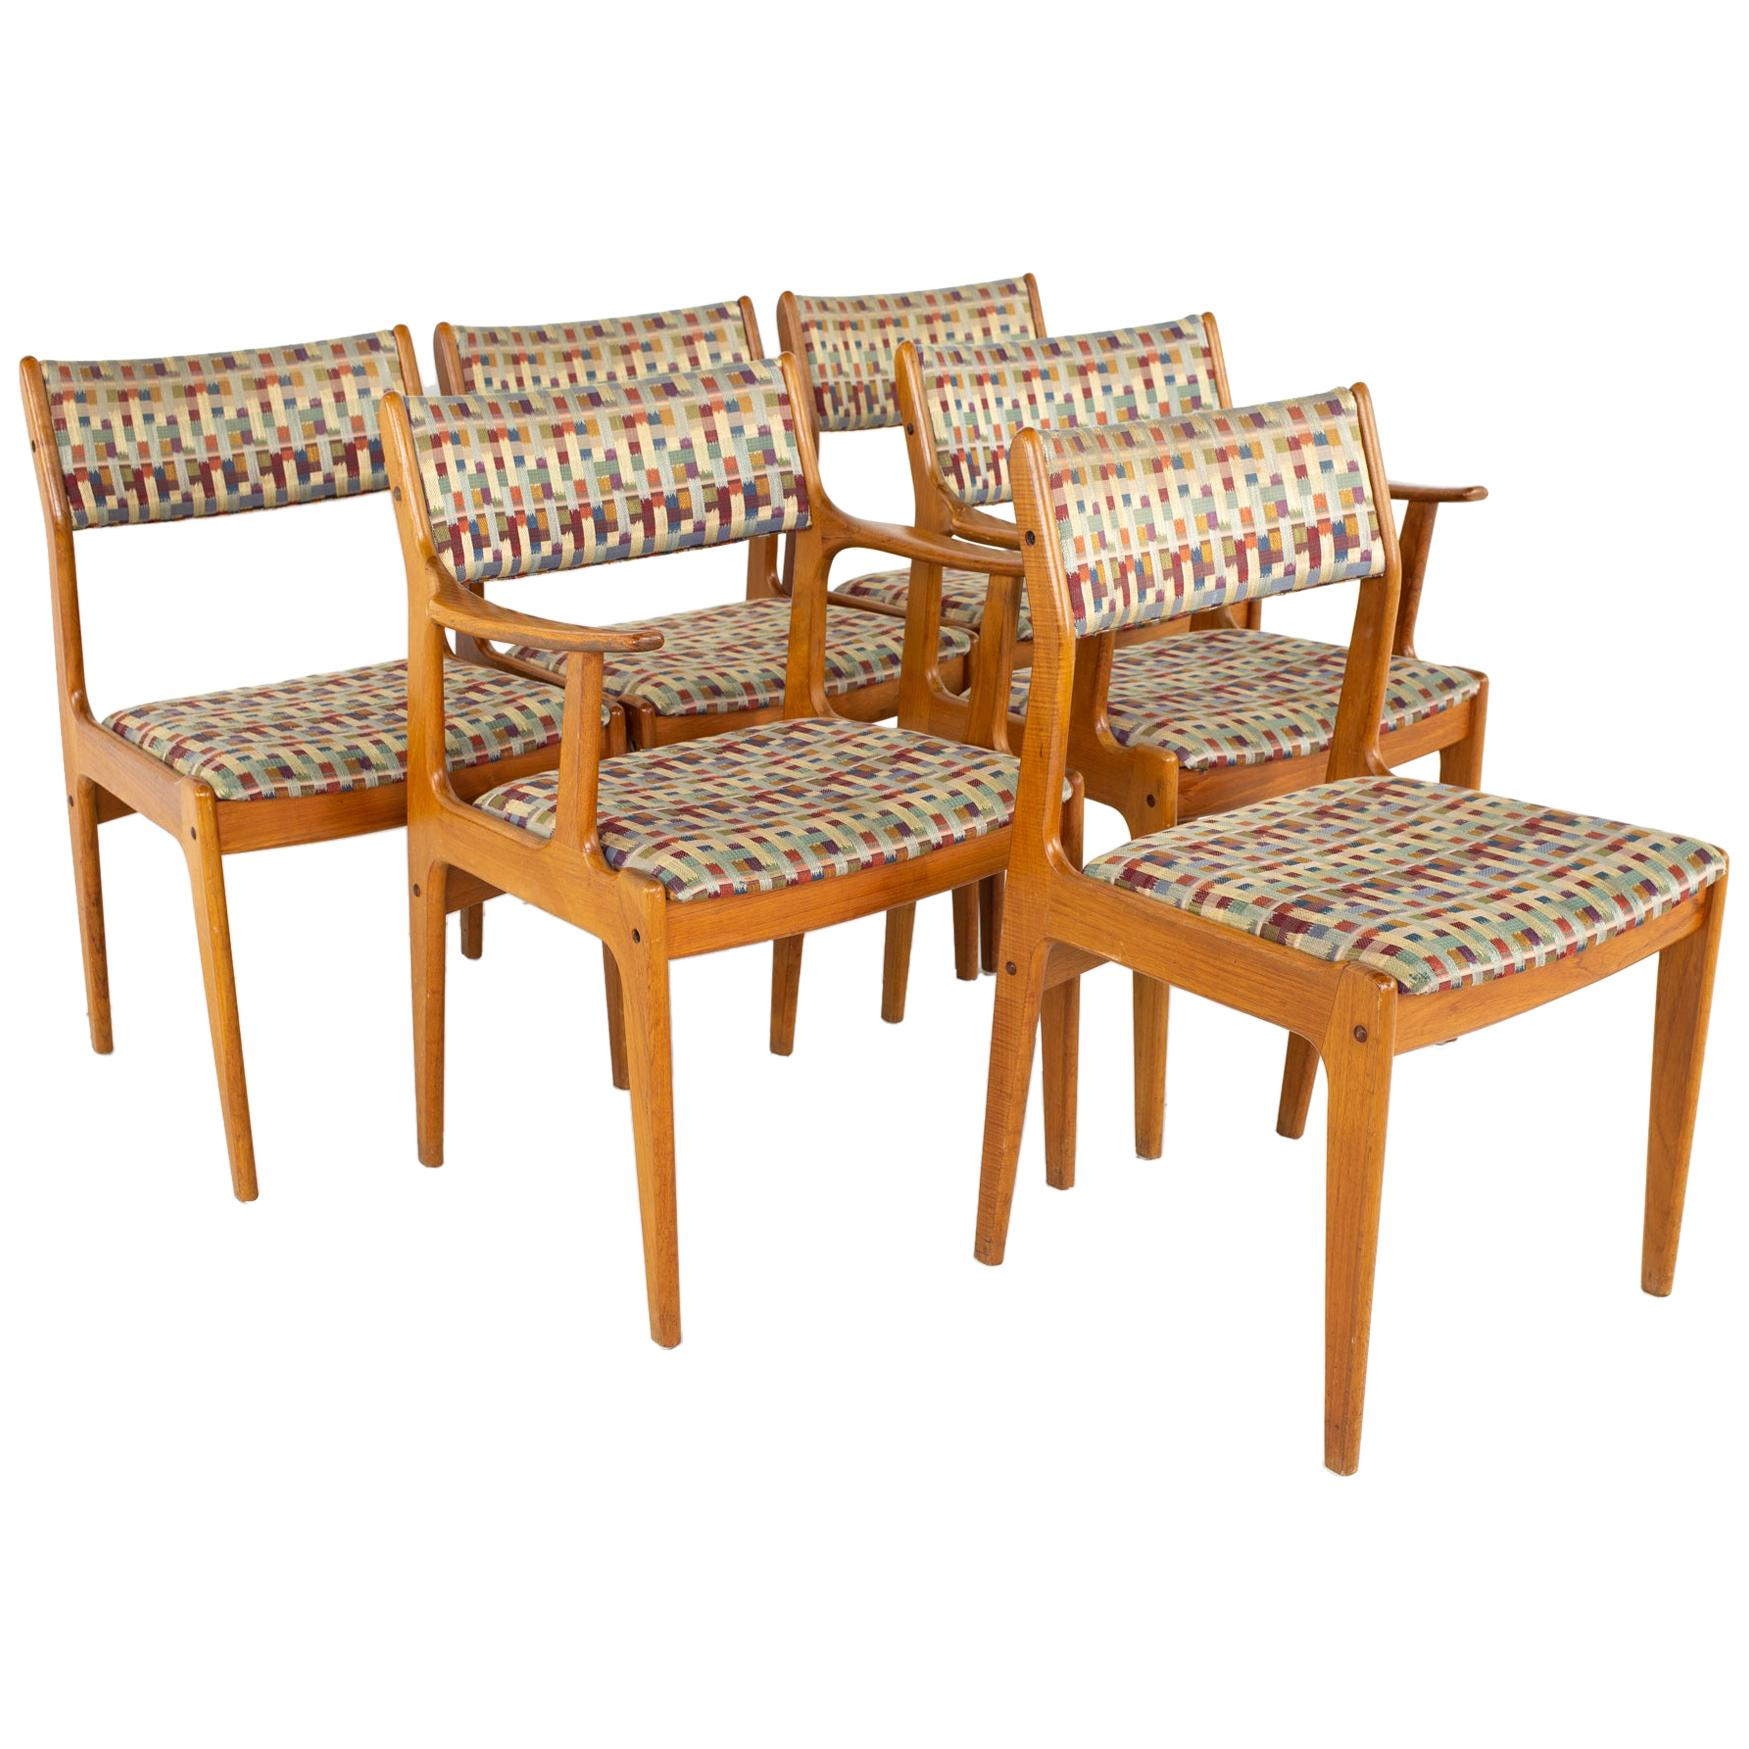 Mid Century Teak Dining Chairs, Set of 6